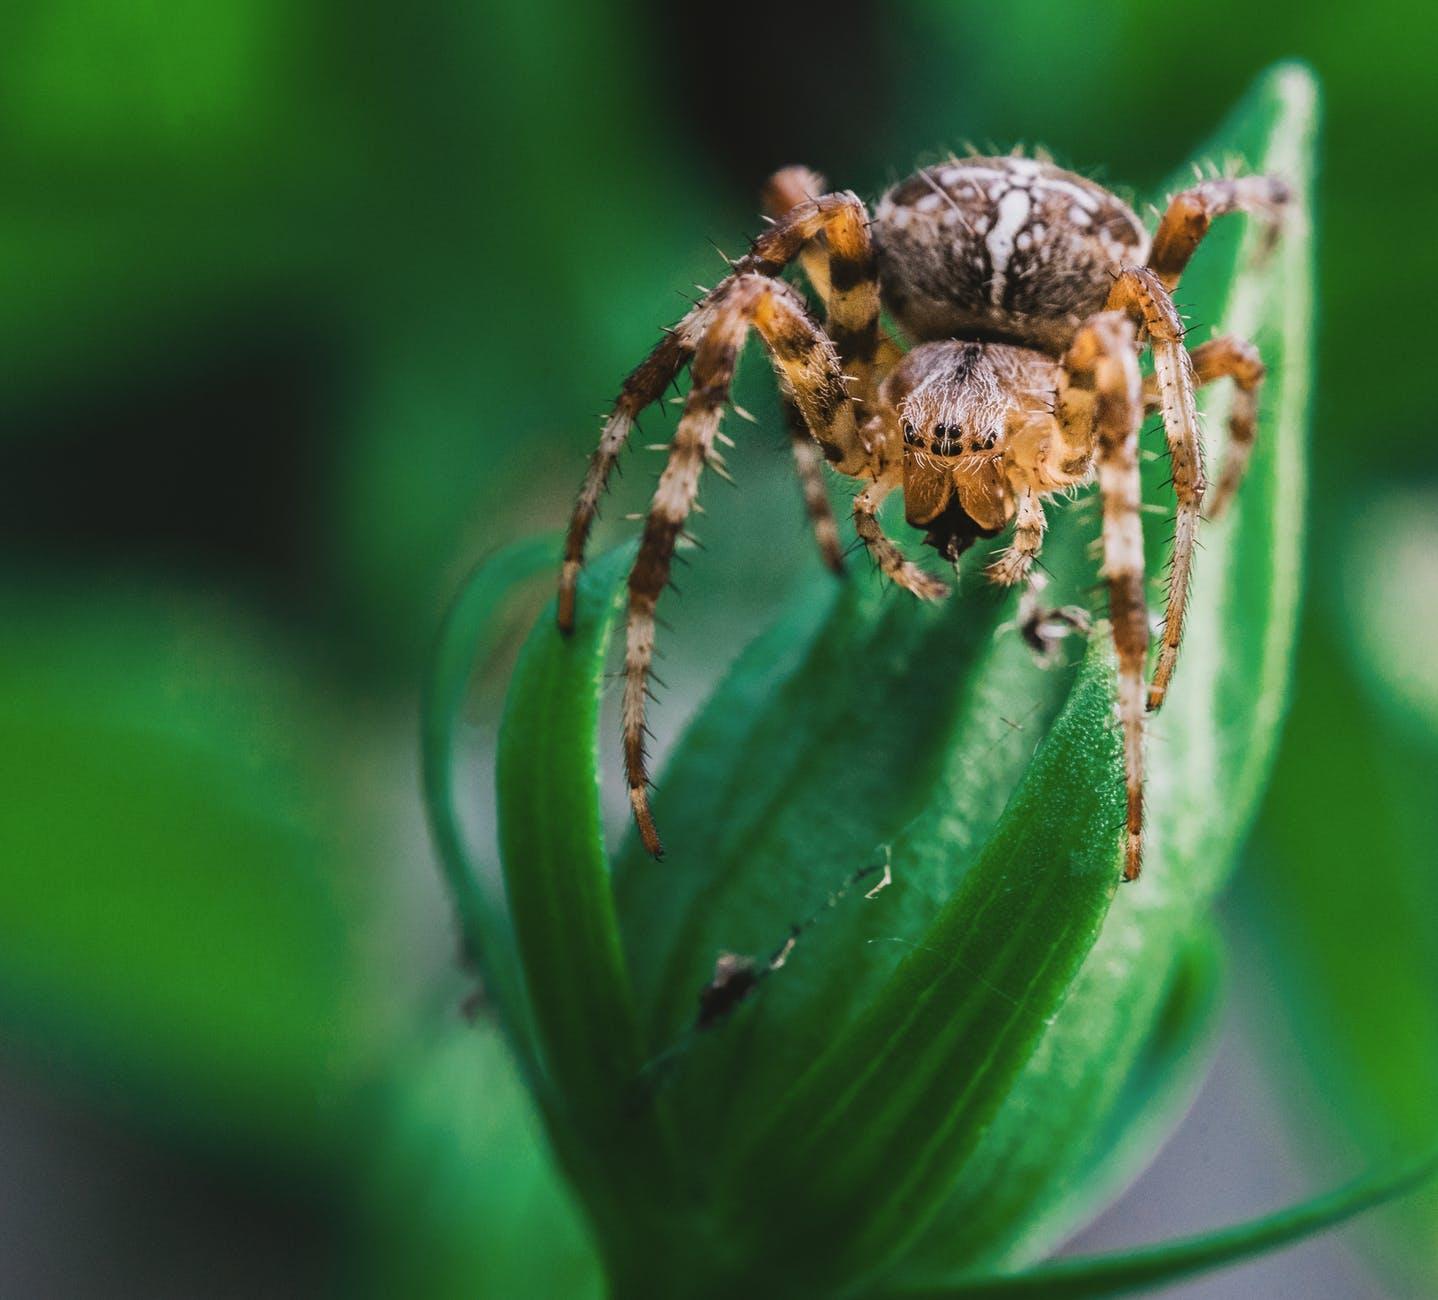 arachnid close up creepy hairy